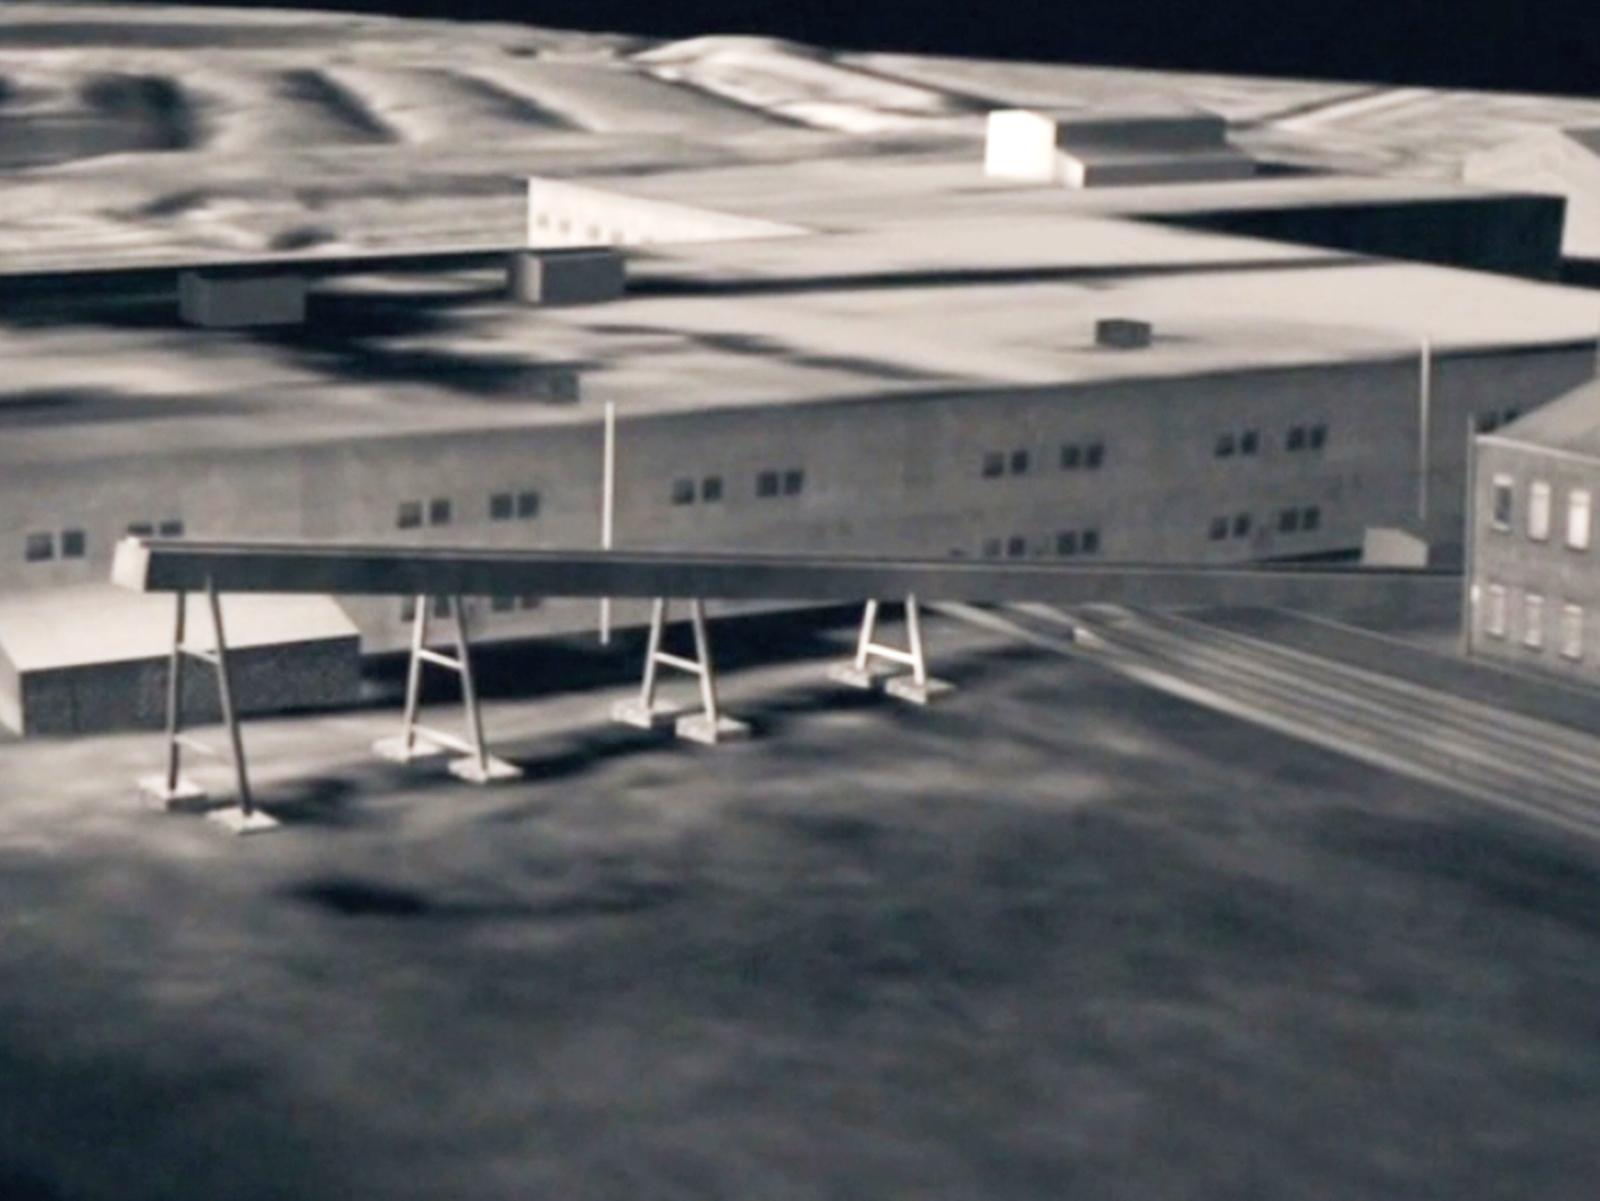 v1-ramp-46meter